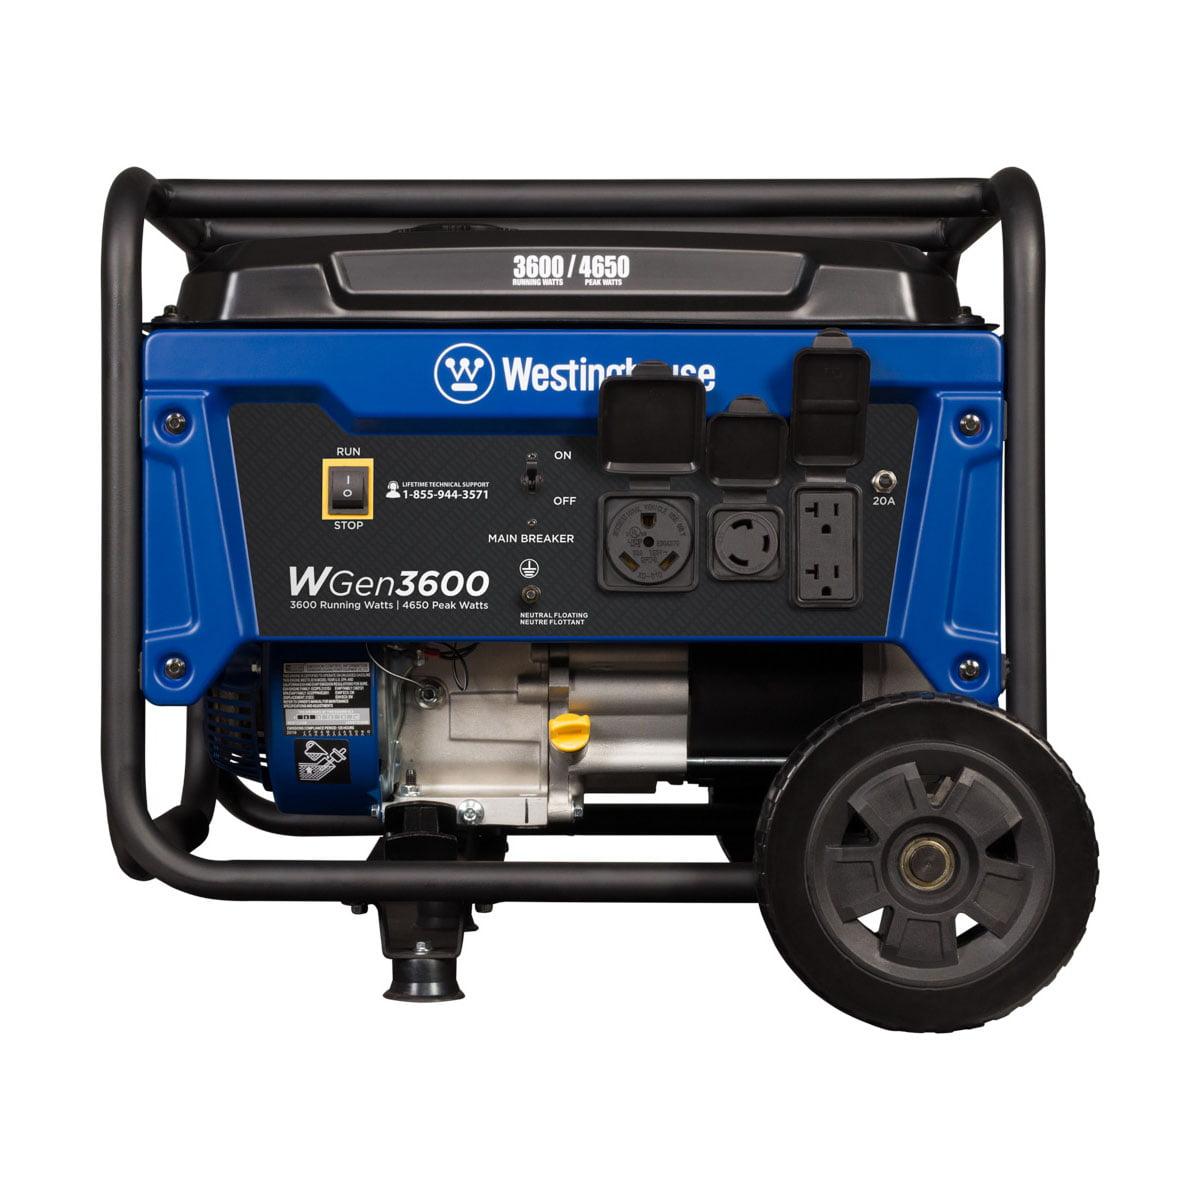 Westinghouse WGen3600 Gas Powered Portable Generator